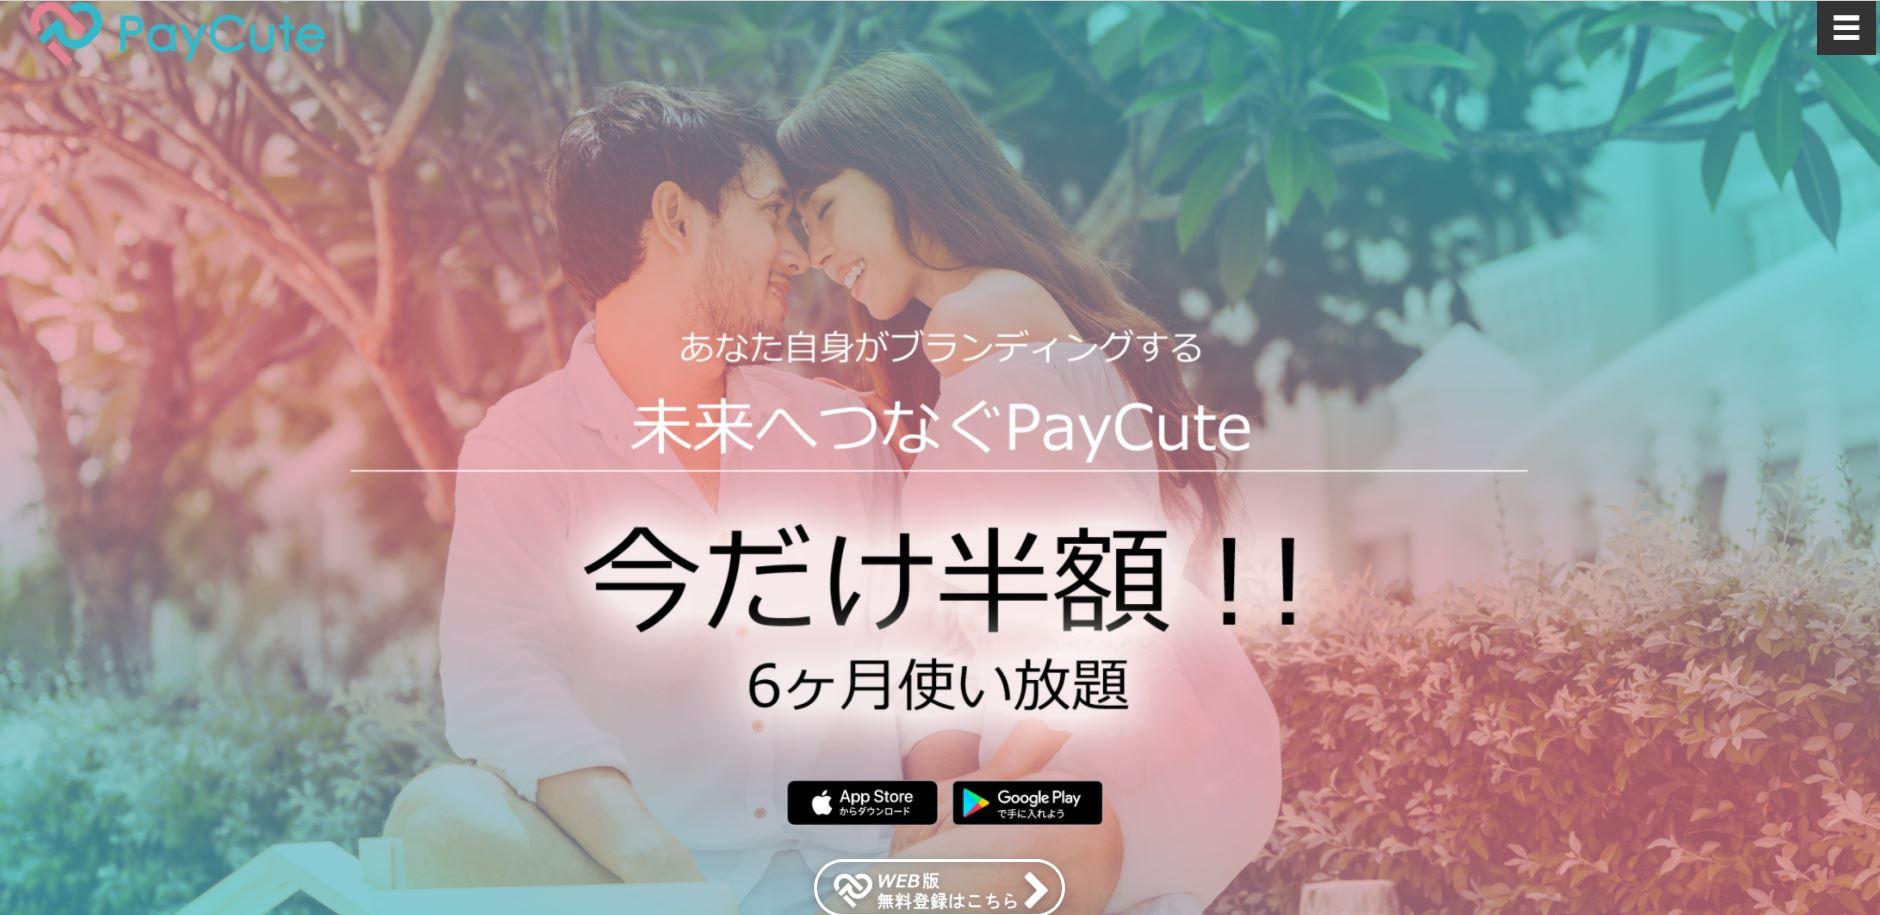 PayCute(ペイキュート)の口コミ評判や特徴・料金・使い方などを徹底解説します!